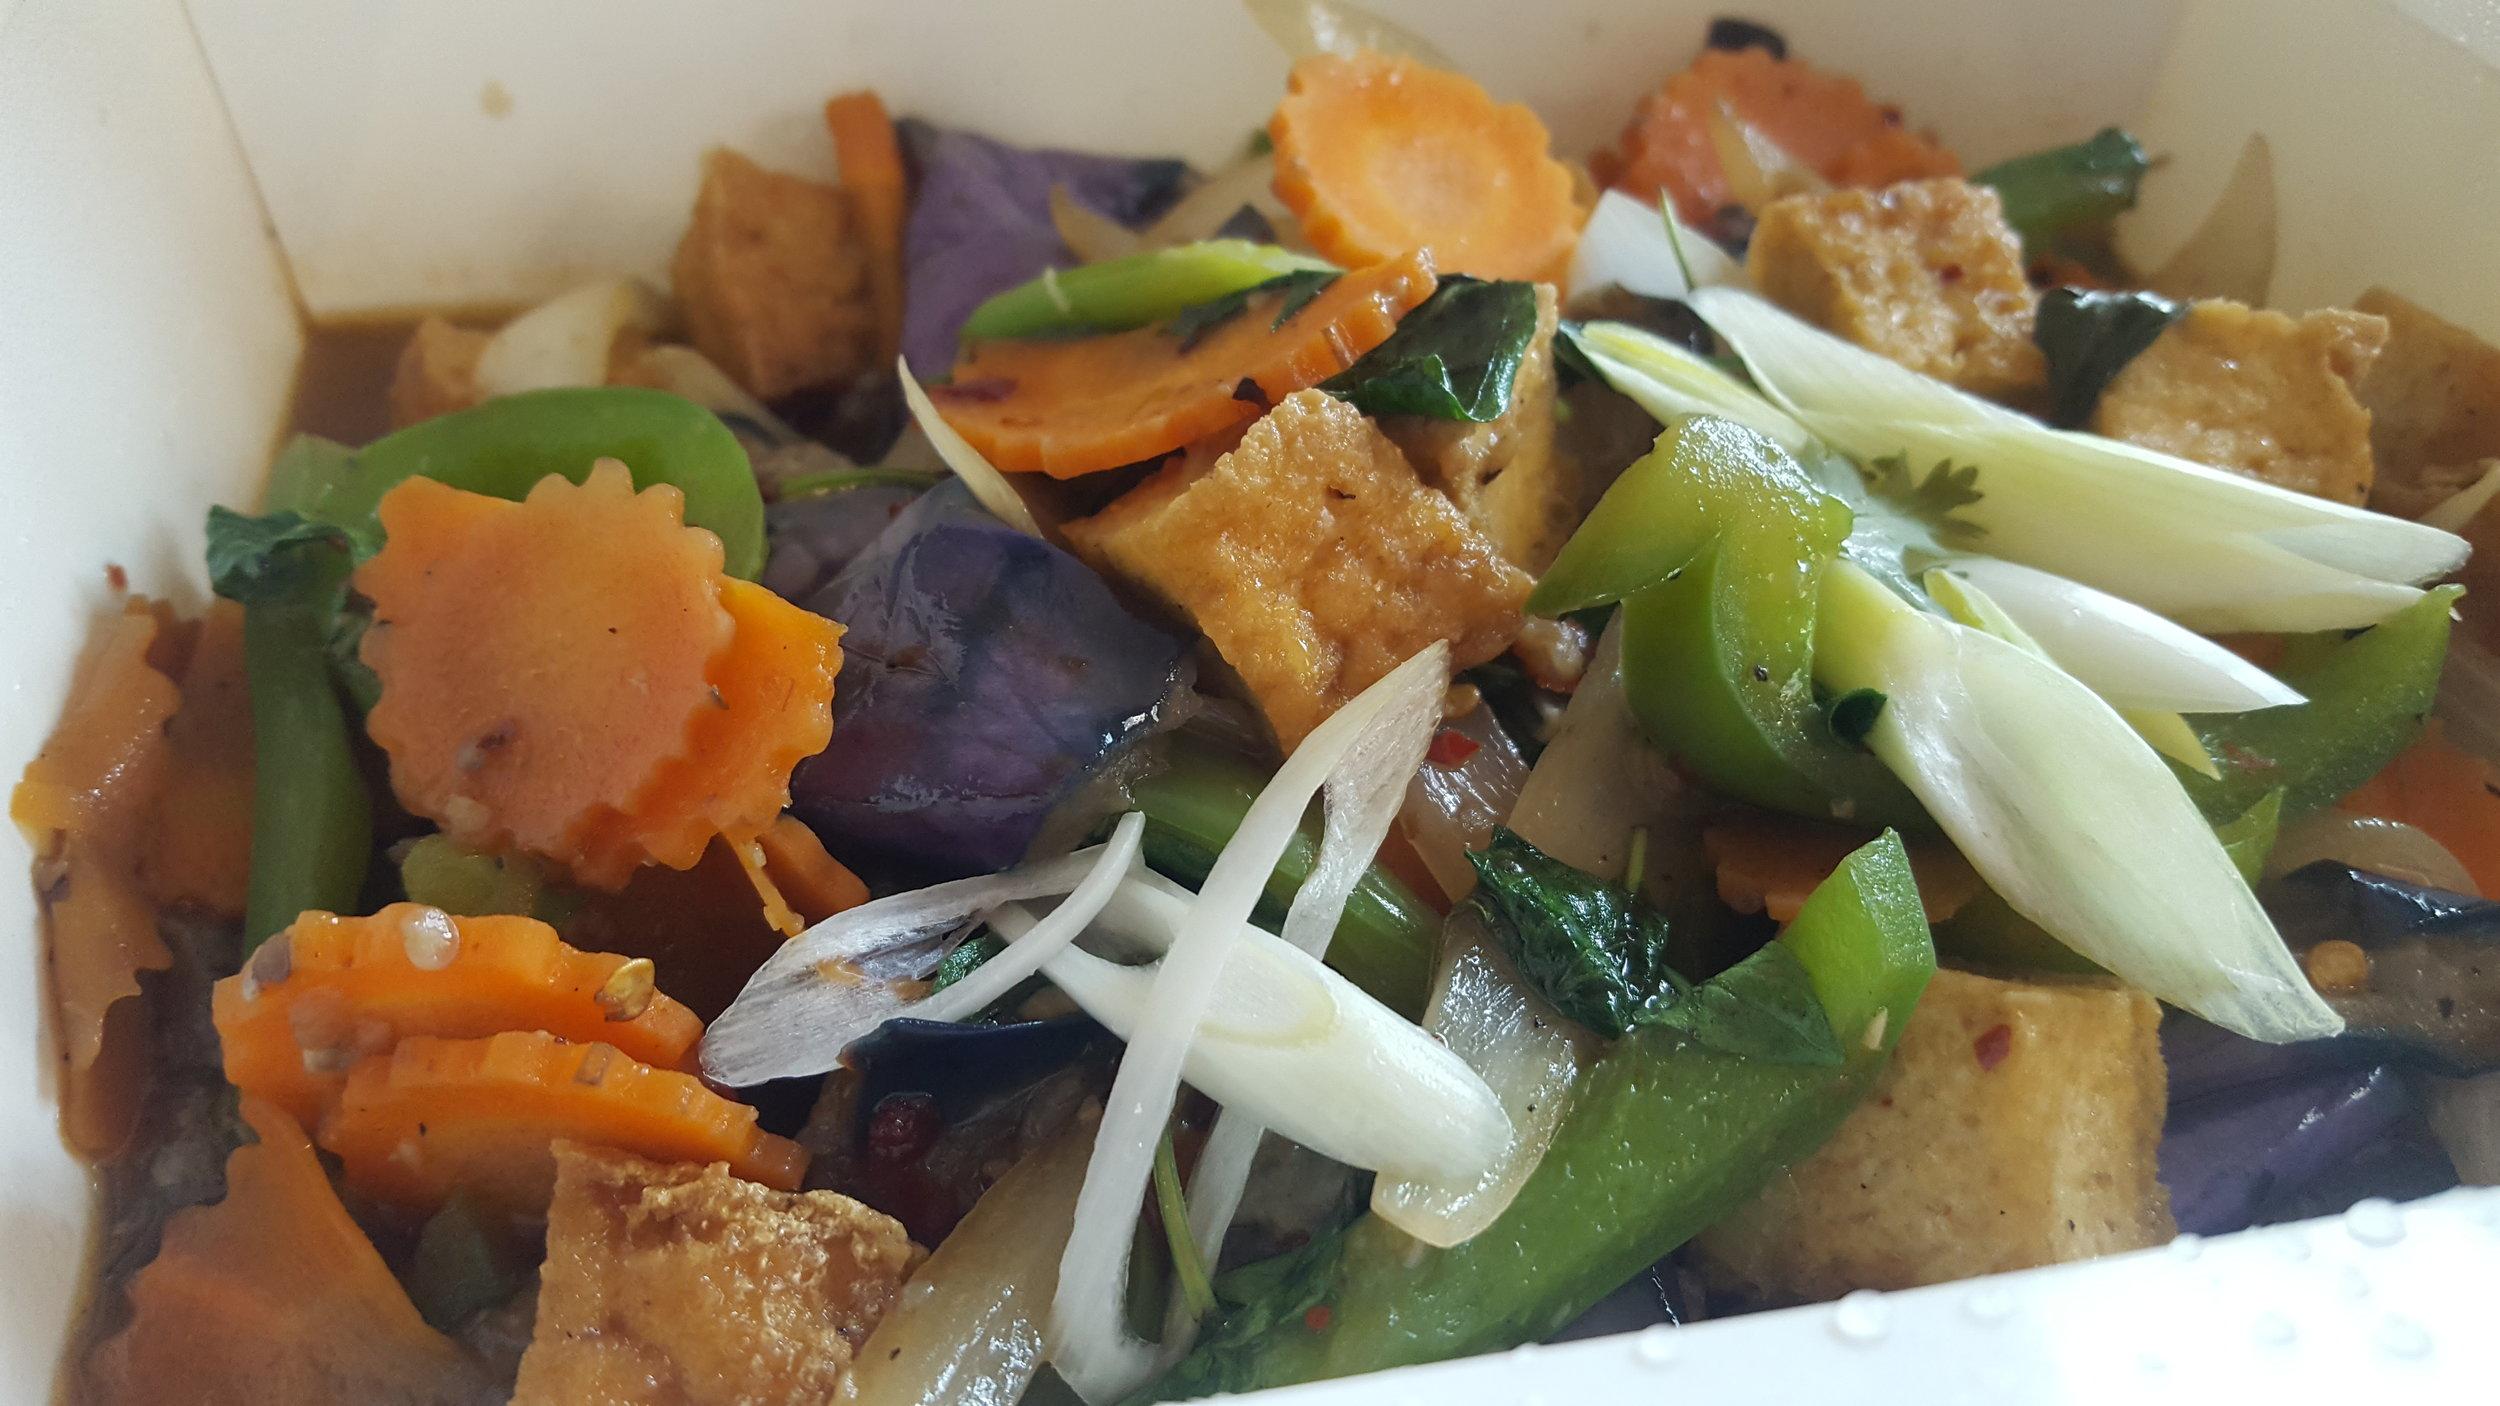 Spicy eggplant w/ tofu